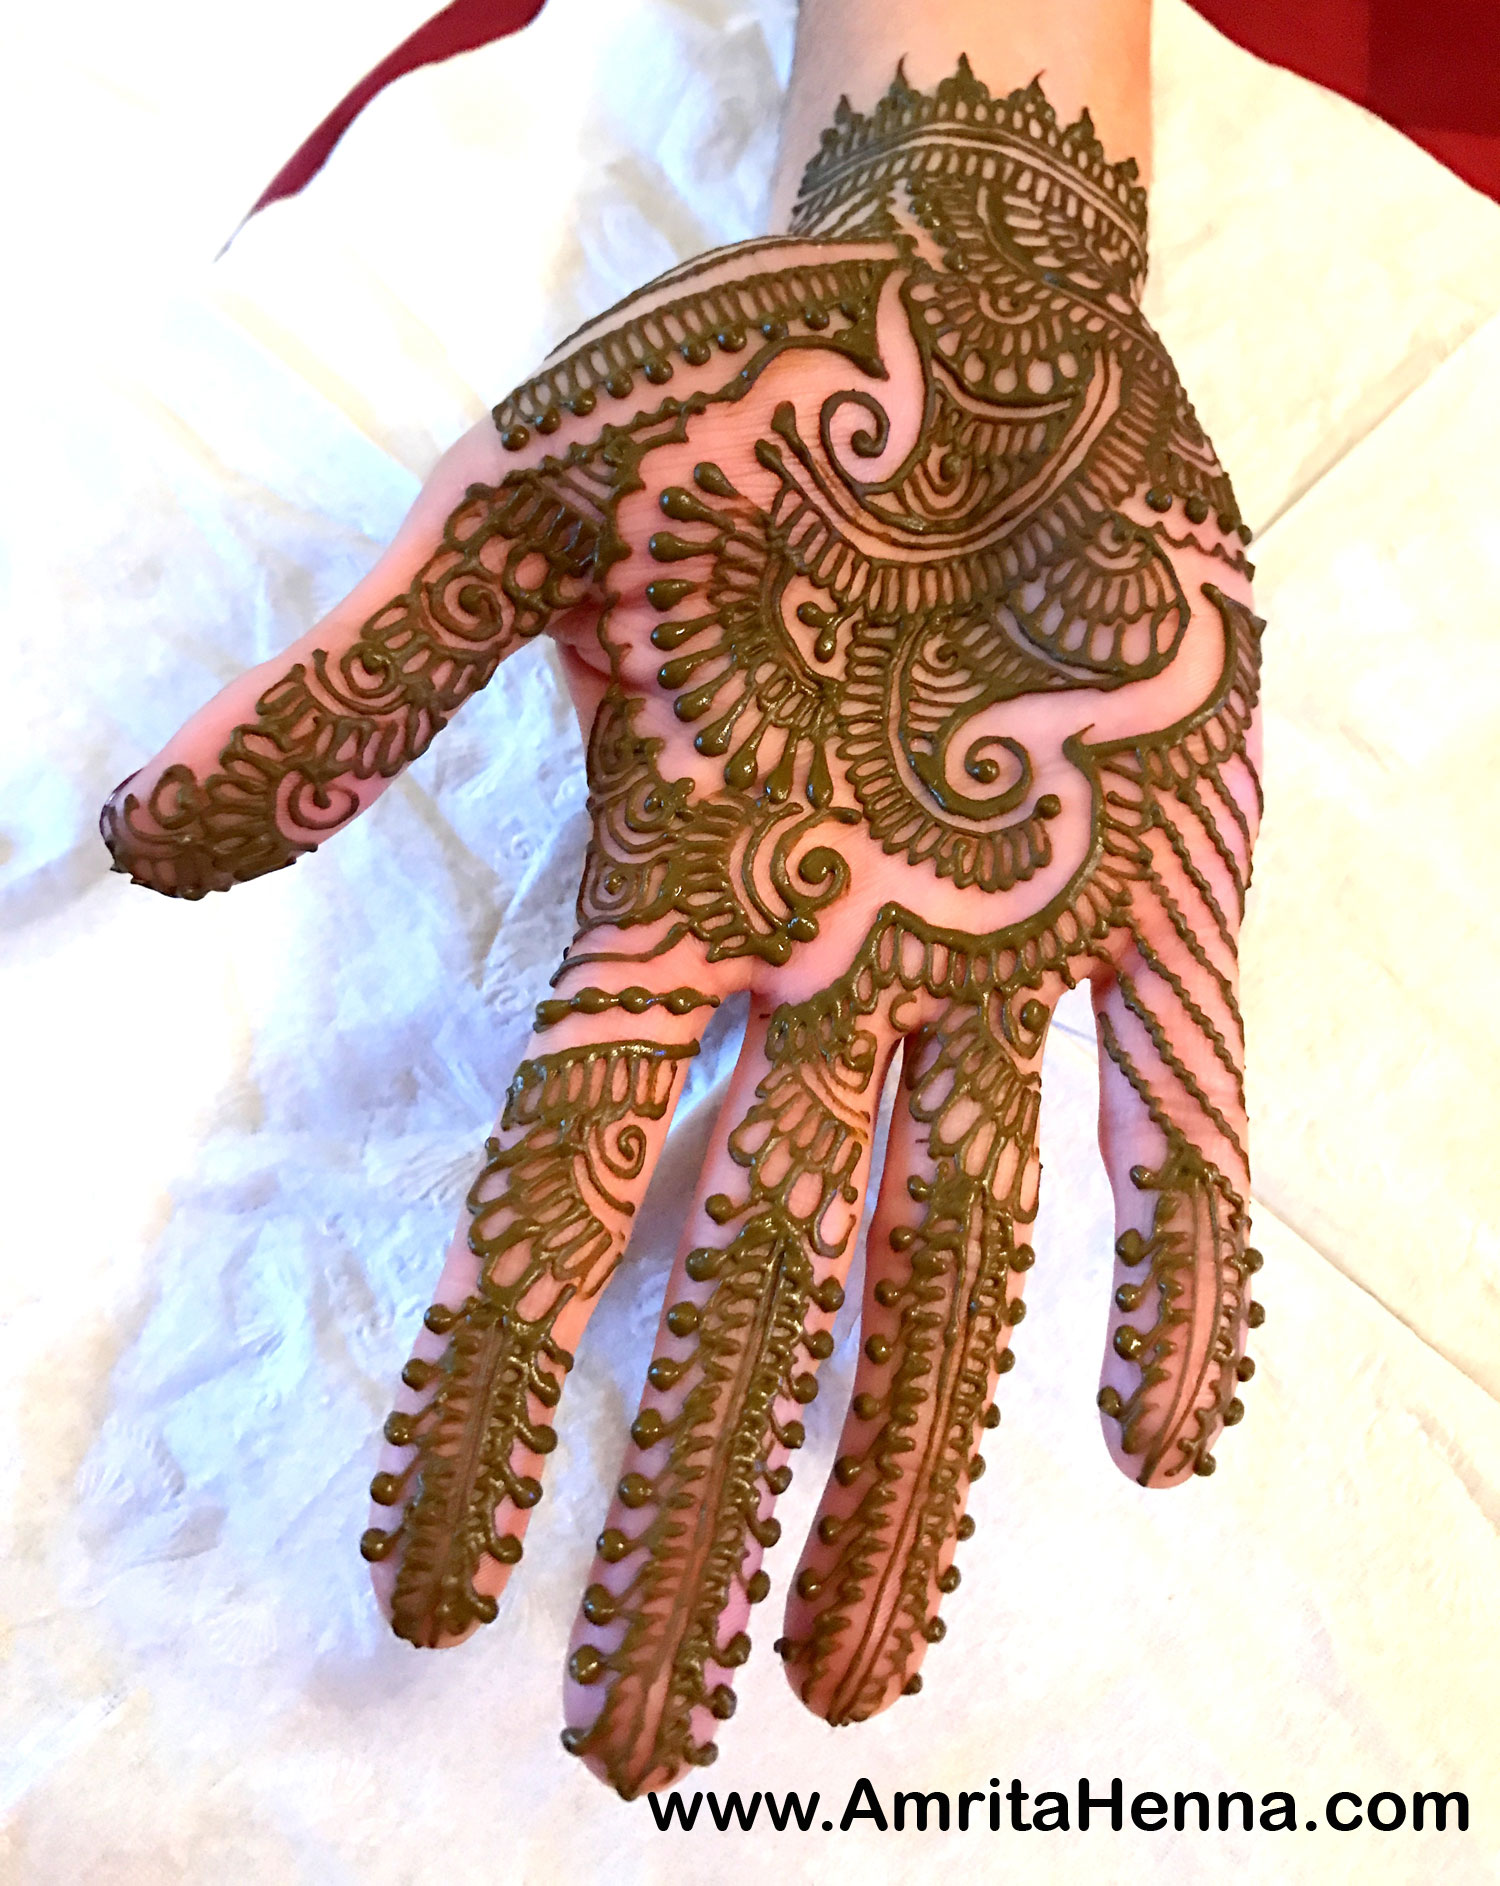 Top 10 Full Hand Henna Designs - 10 Best Mehndi Designs Full Hands for Indian Weddings - 10 Stunning Full Hand Bridal Henna Designs - Indian Weddings Full Hand Mehendi Designs - 10 Full Hand Henna Mehndi Designs You Must Try this Wedding Season - Full Hand Mehndi Designs for this Wedding Season - 10 Most Popular Full Hand Henna Tattoo Designs for a Bridal Sangeet Party - Full Henna Hands Mehendi Designs - Top 10 Full Henna Hand Designs